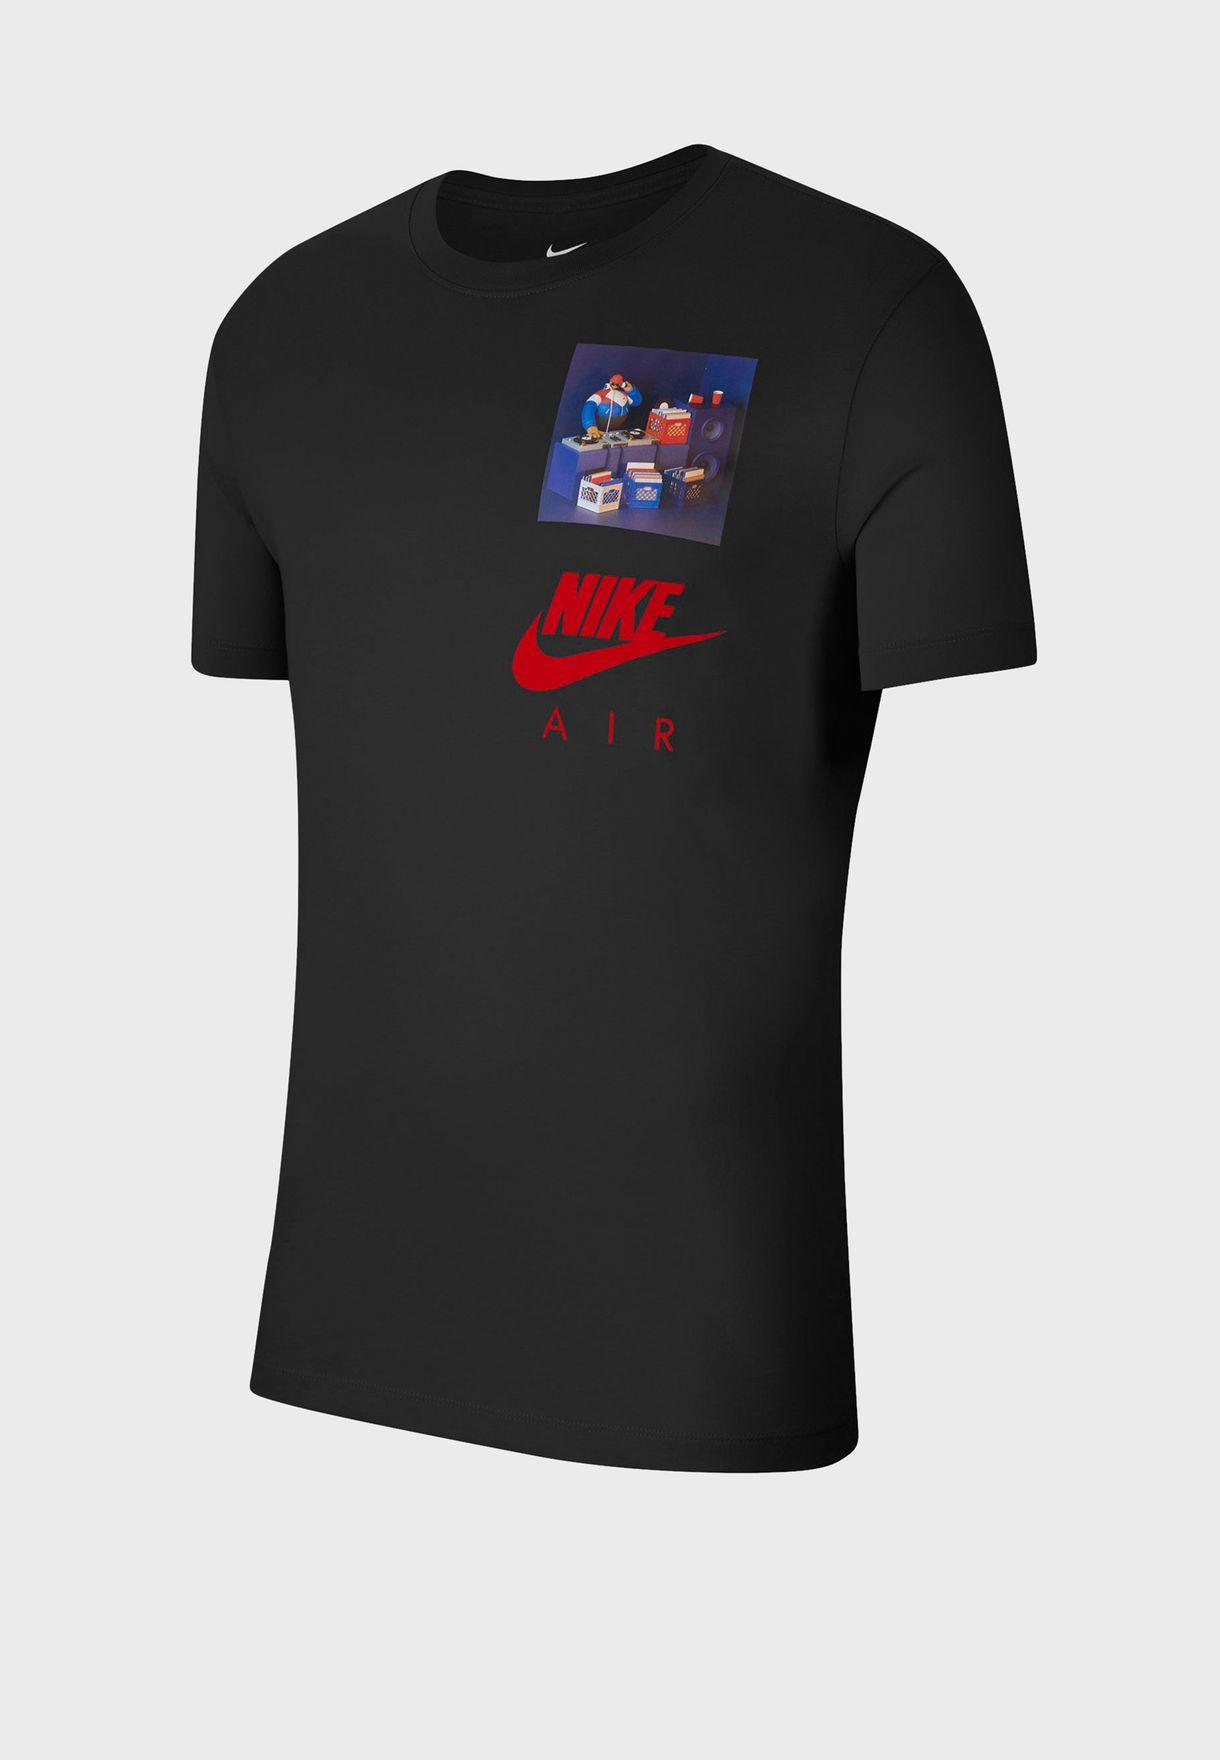 NSW Airman DJ T-Shirt